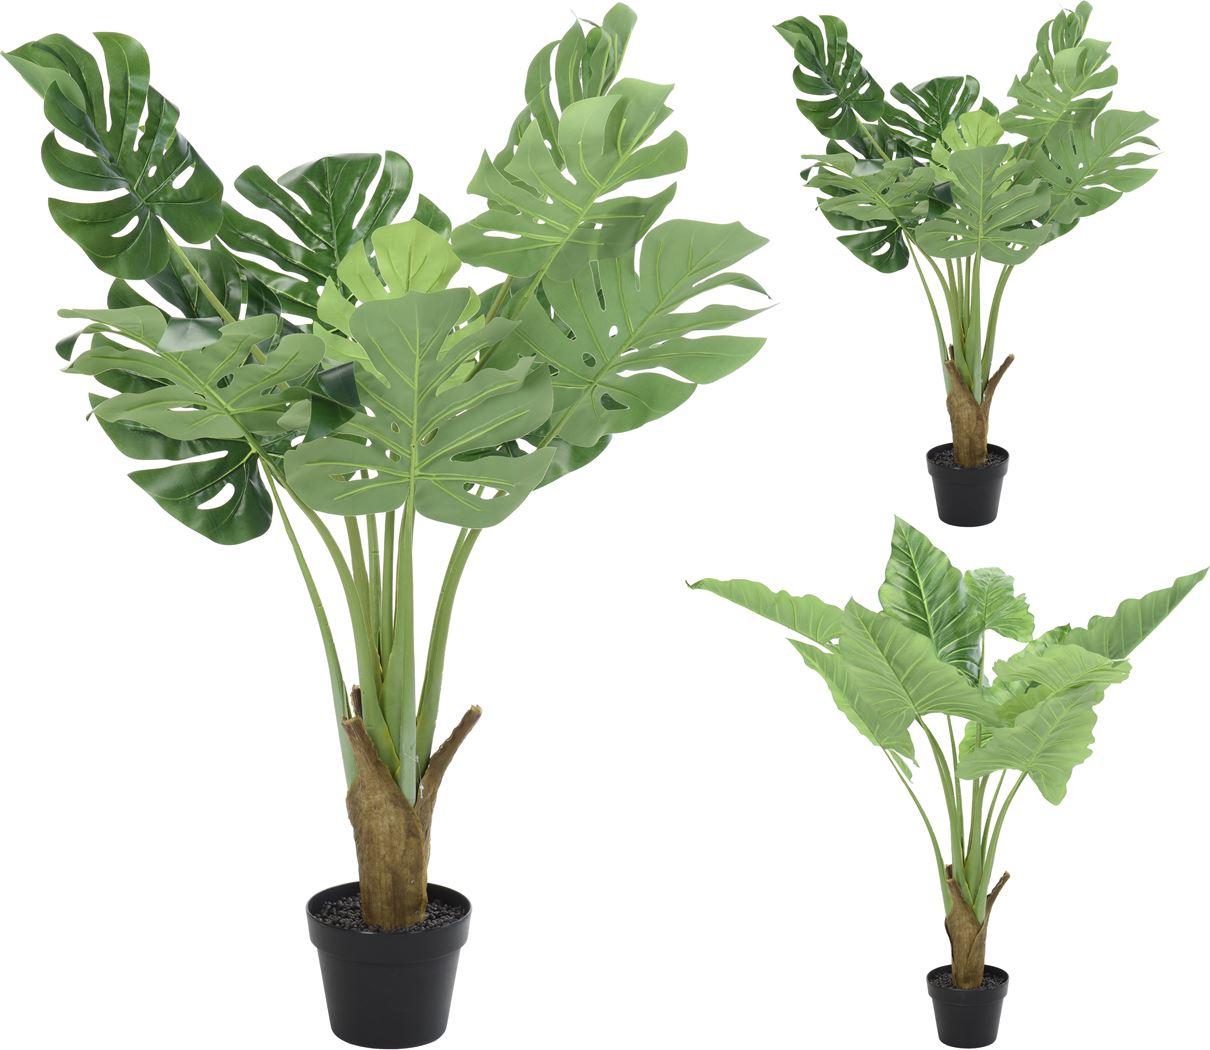 kunststof plant in pot